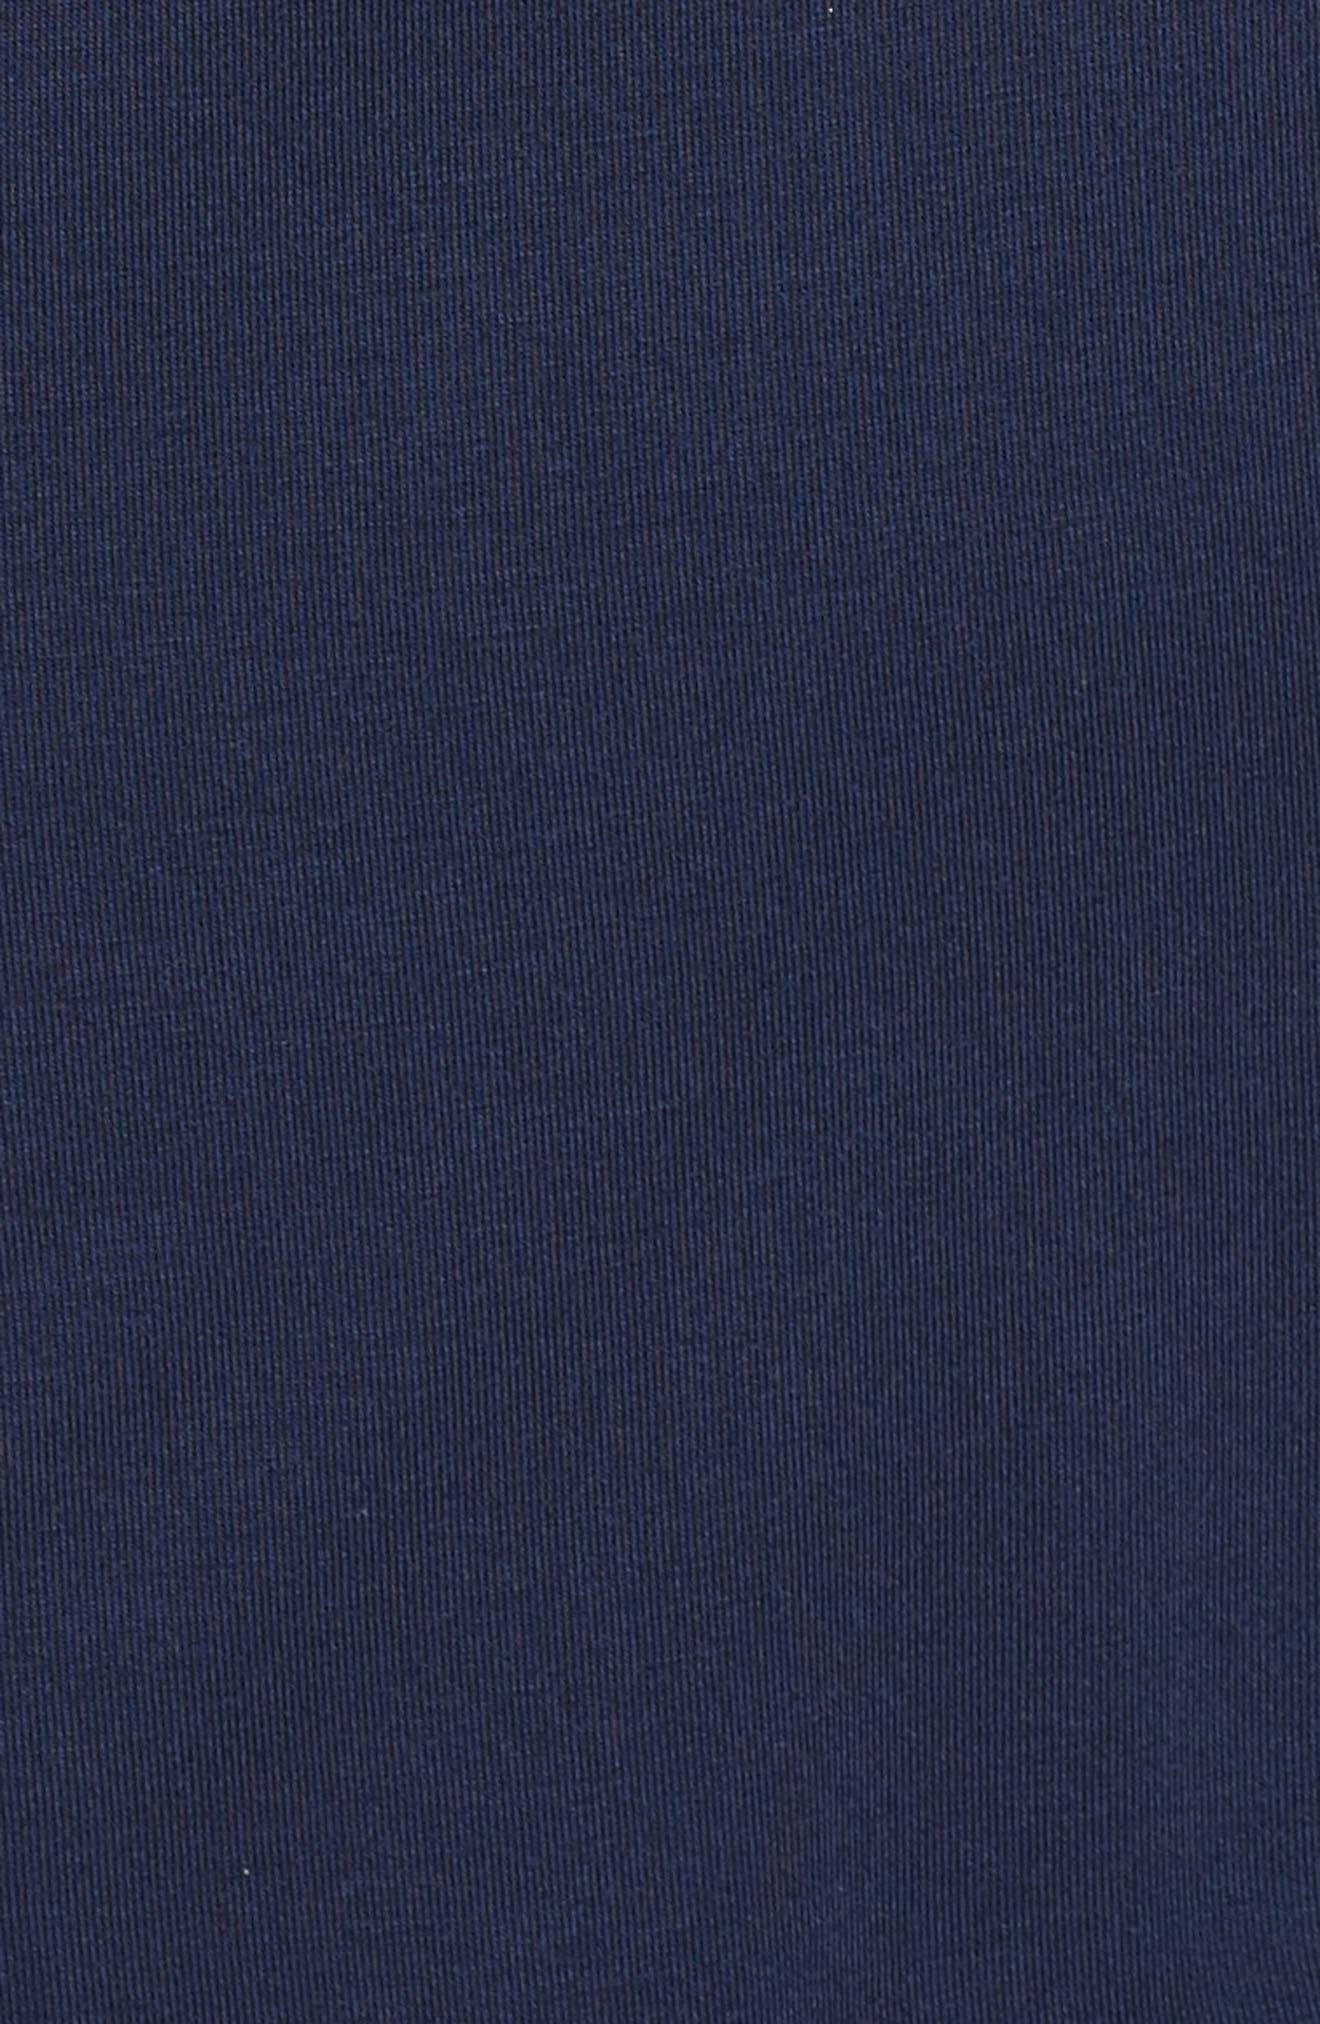 LAUREN RALPH LAUREN, Pajamas, Alternate thumbnail 5, color, SPRING NAVY